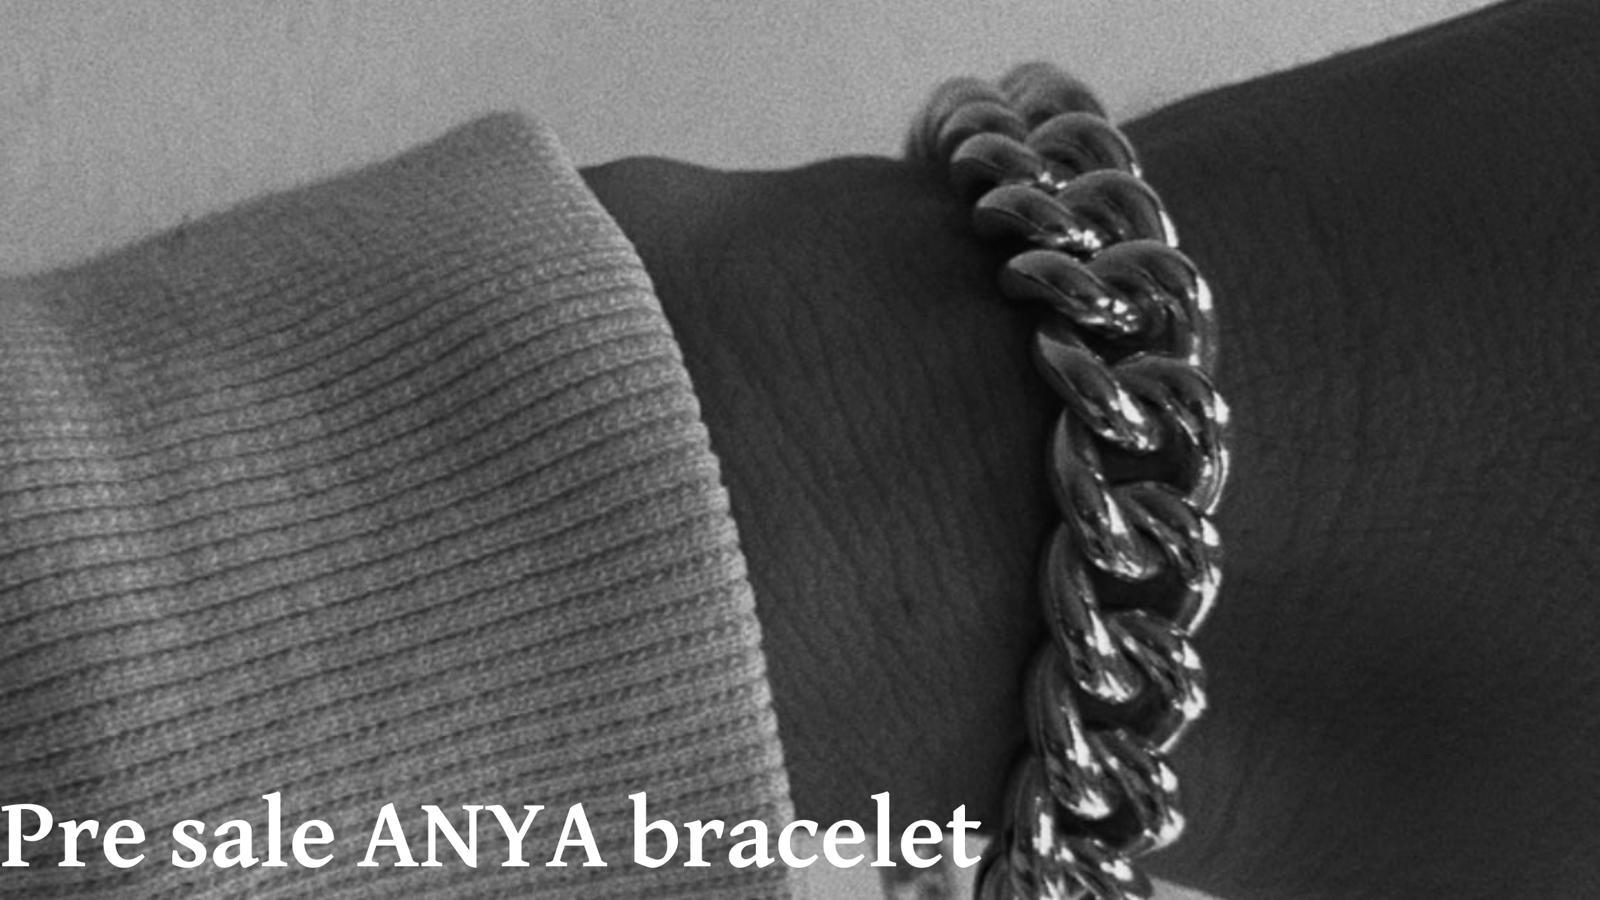 PRE-SALE Anya bracelets - מיכל בן עמי